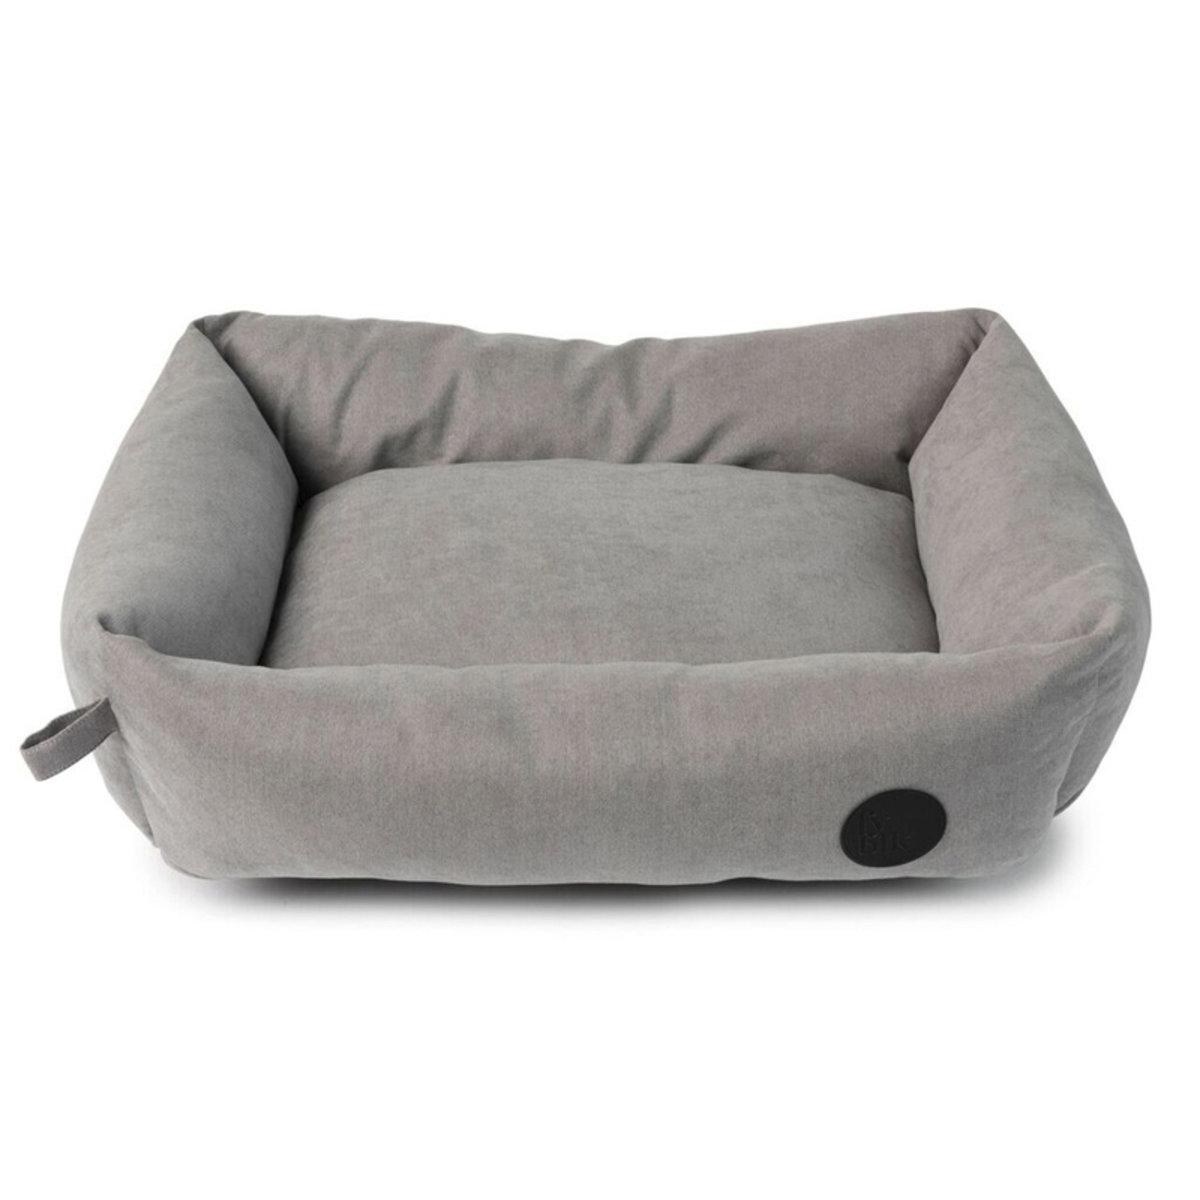 The Lounge Bed - Stone Grey Medium K30